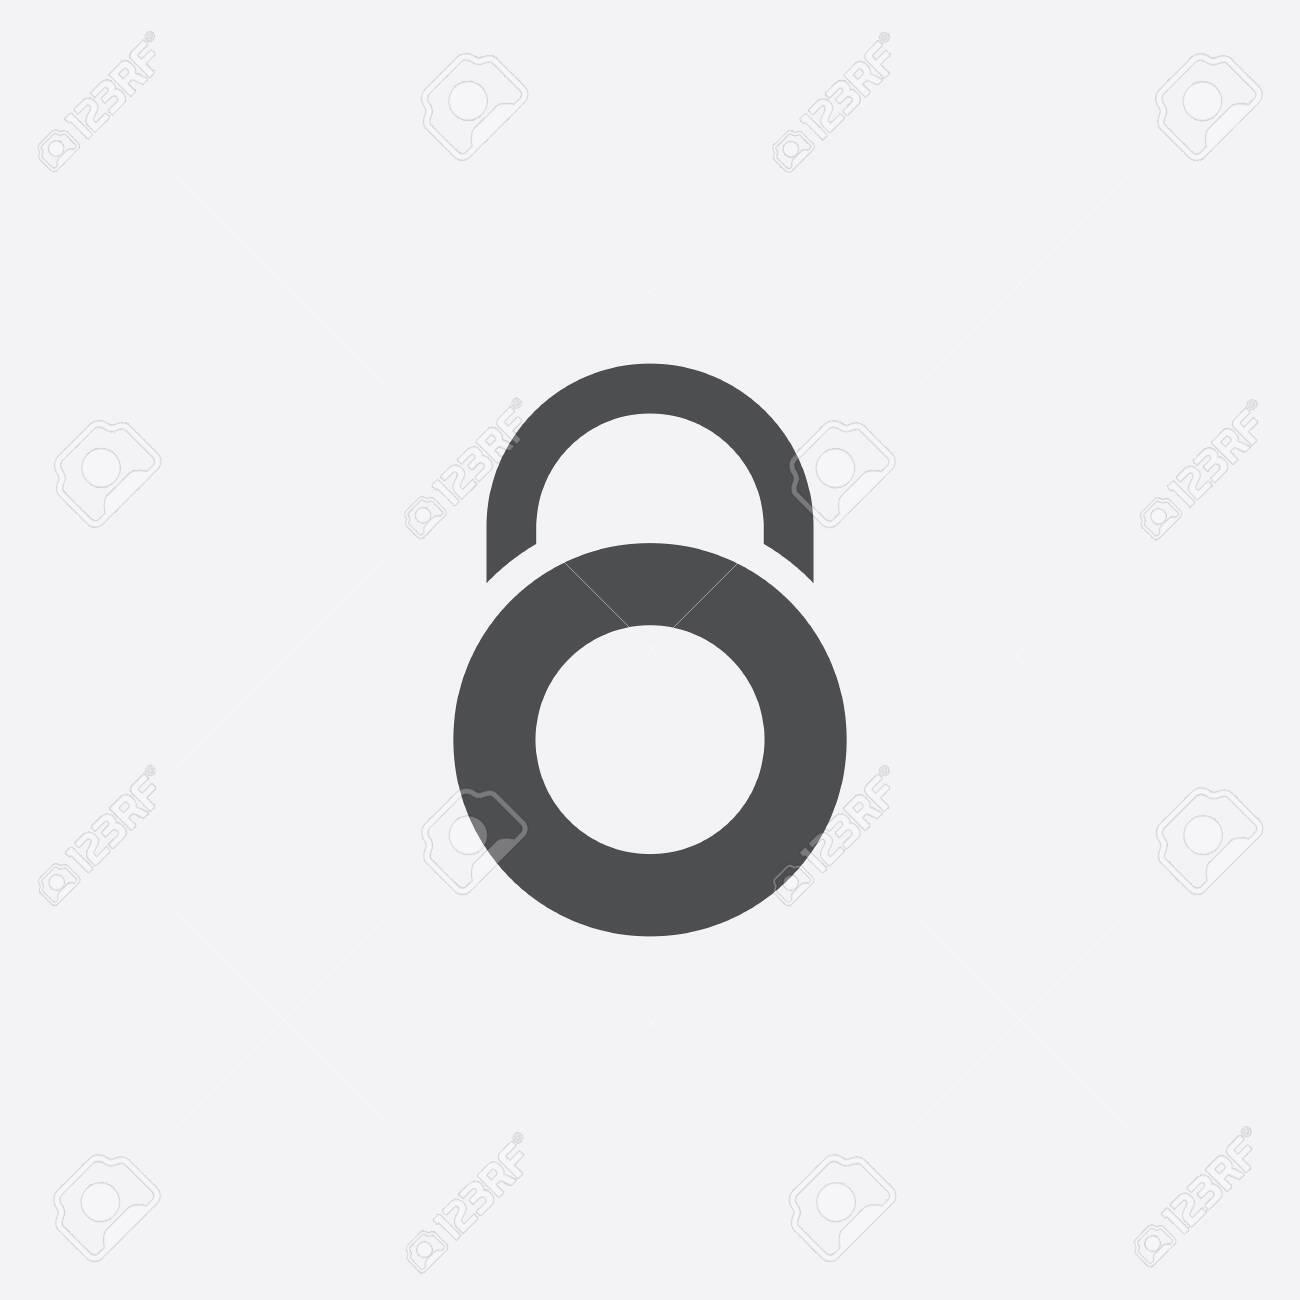 lock icon - 143431874